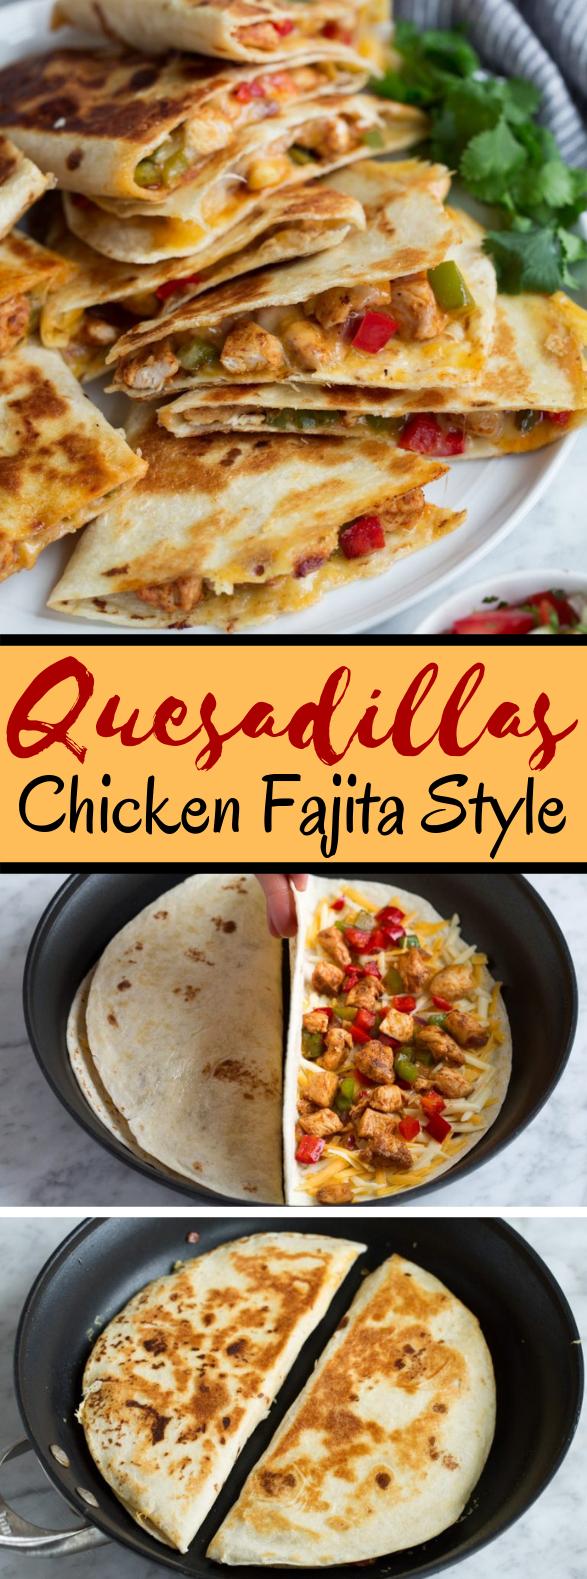 Quesadillas {Chicken Fajita Style} #dinner #mexican